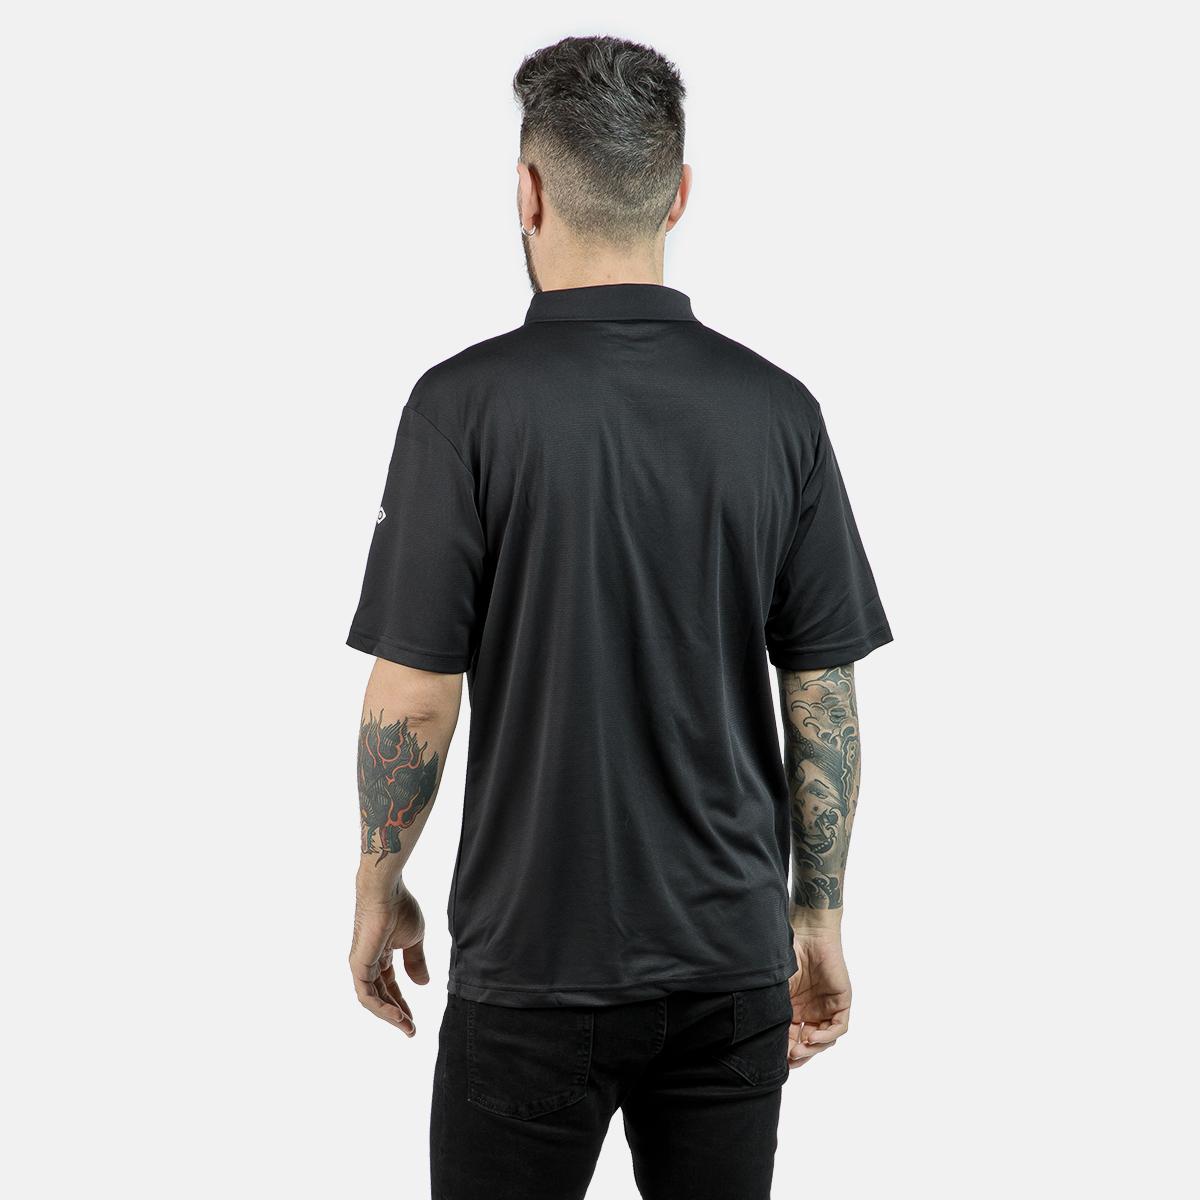 MAN'S ACAY POLO T-SHIRT BLACK